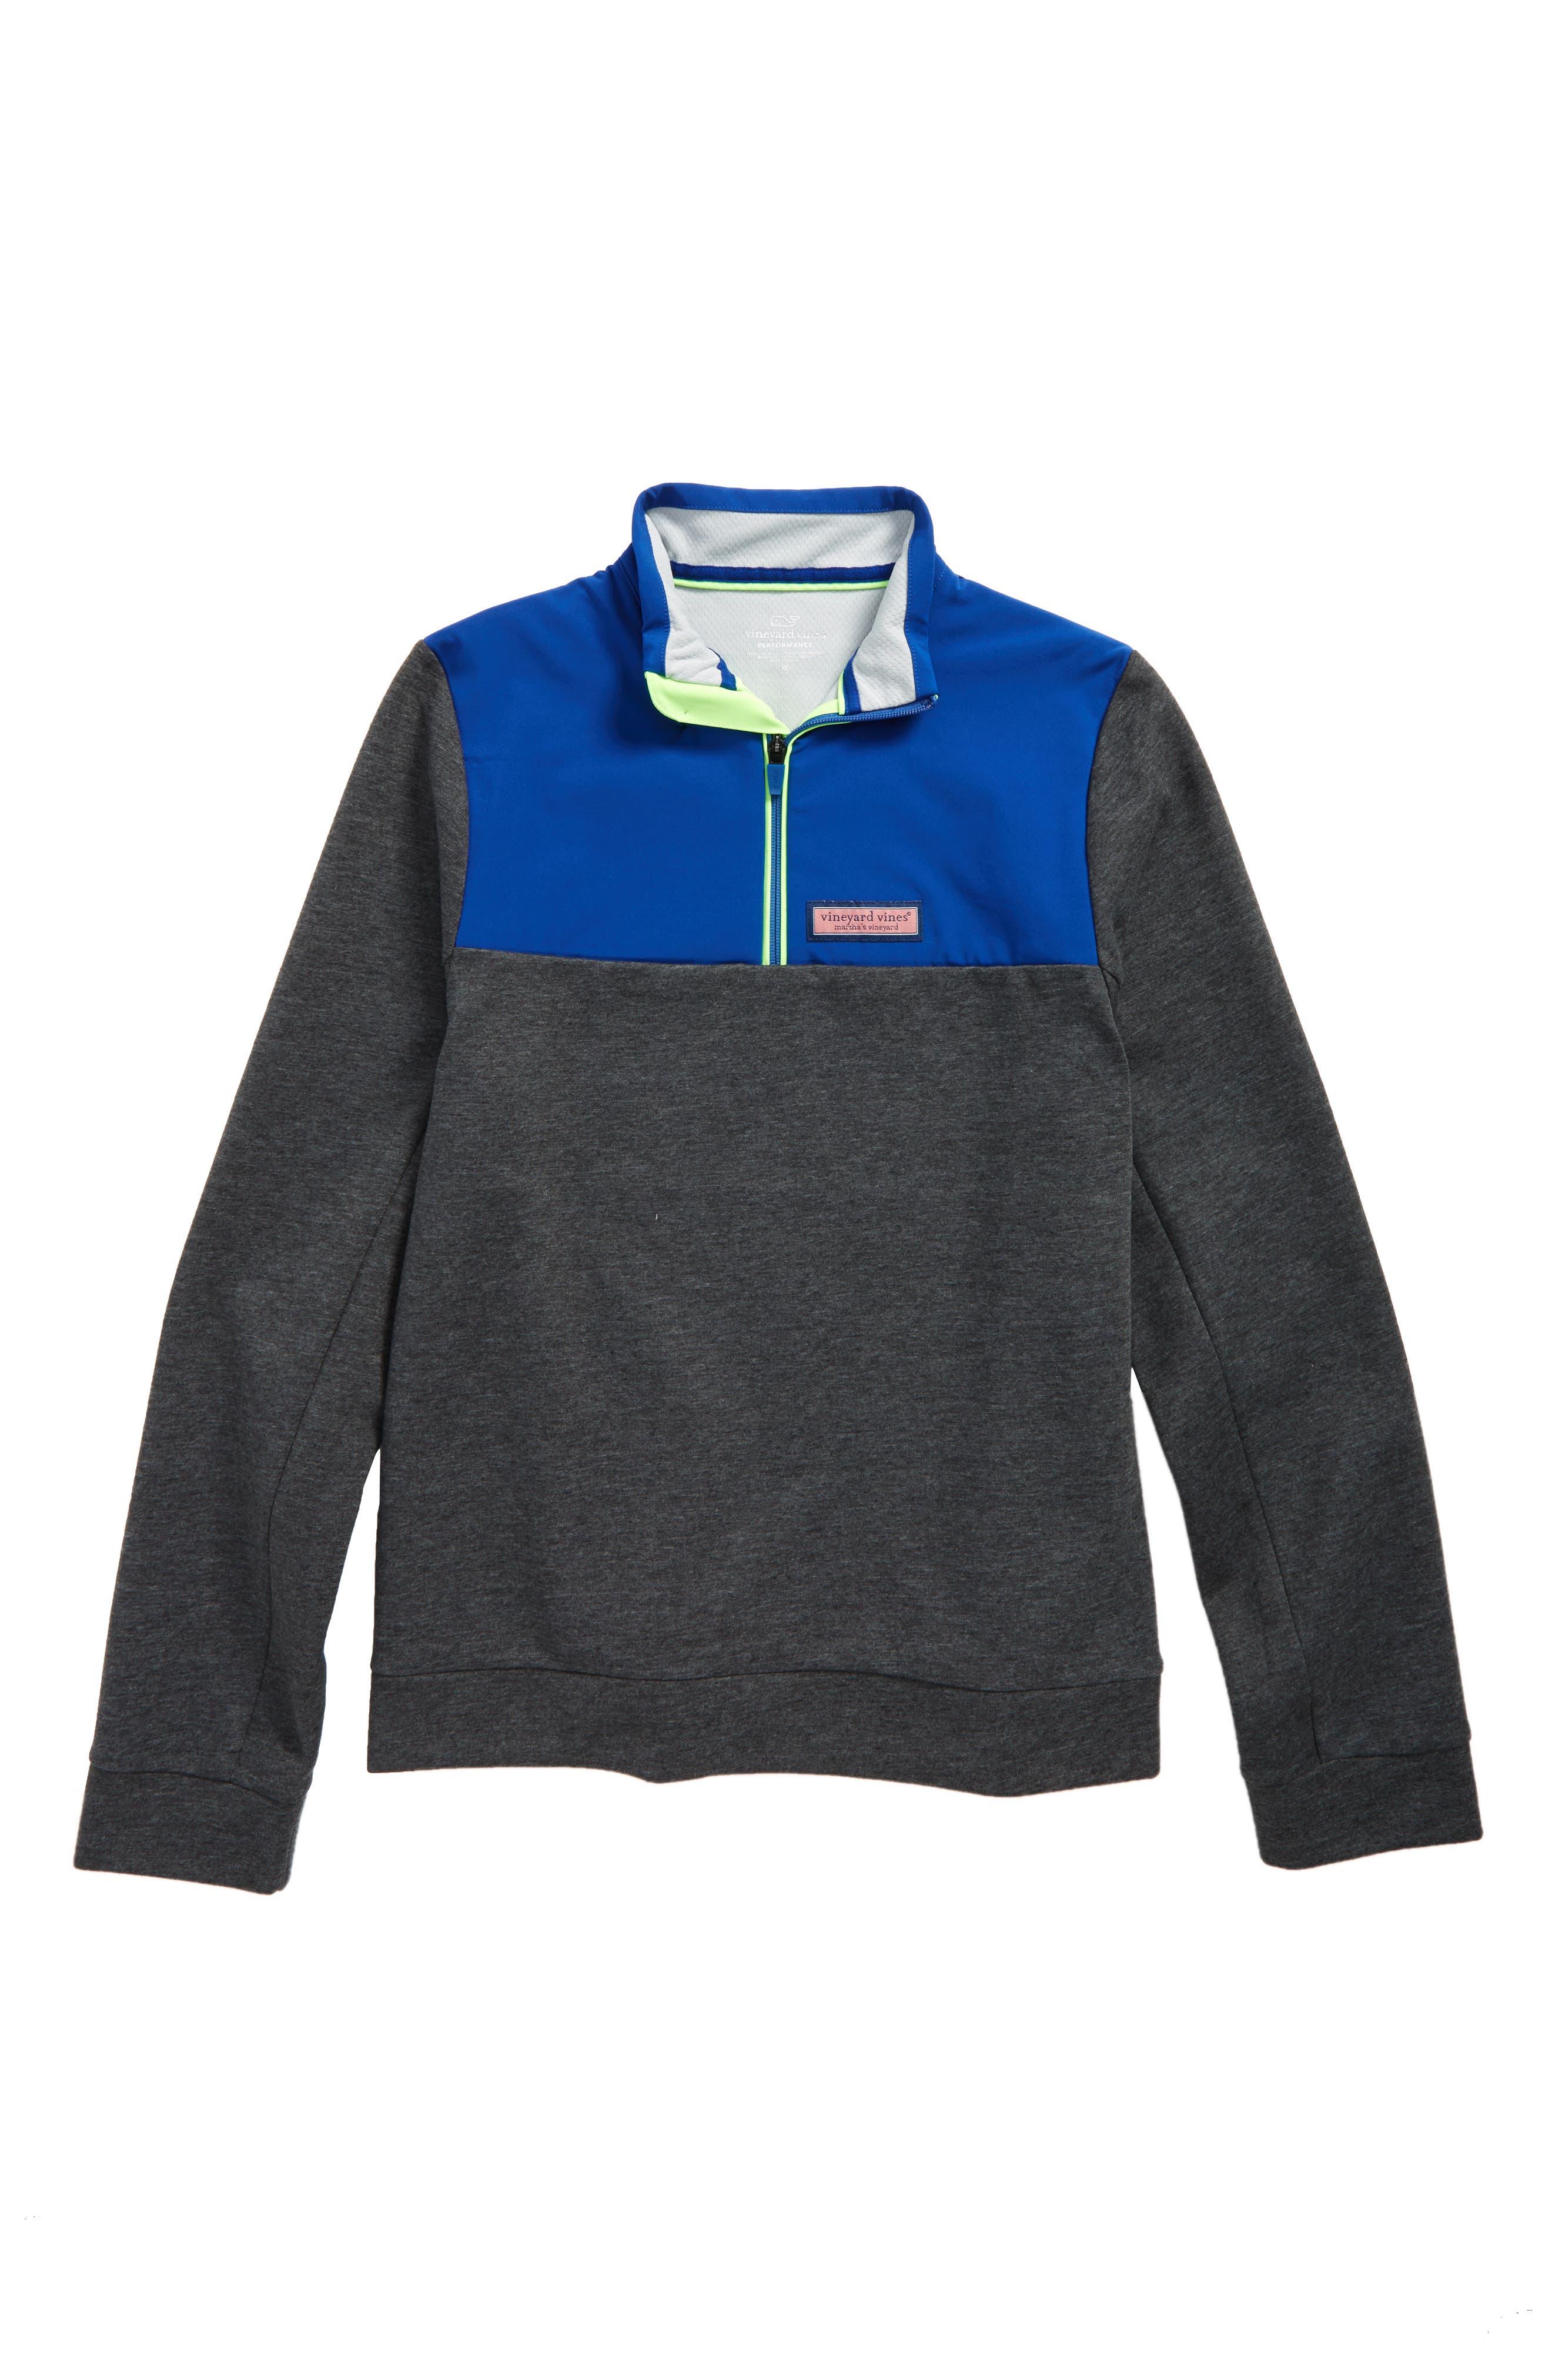 Shep Colorblock Quarter Zip Pullover,                         Main,                         color, 020